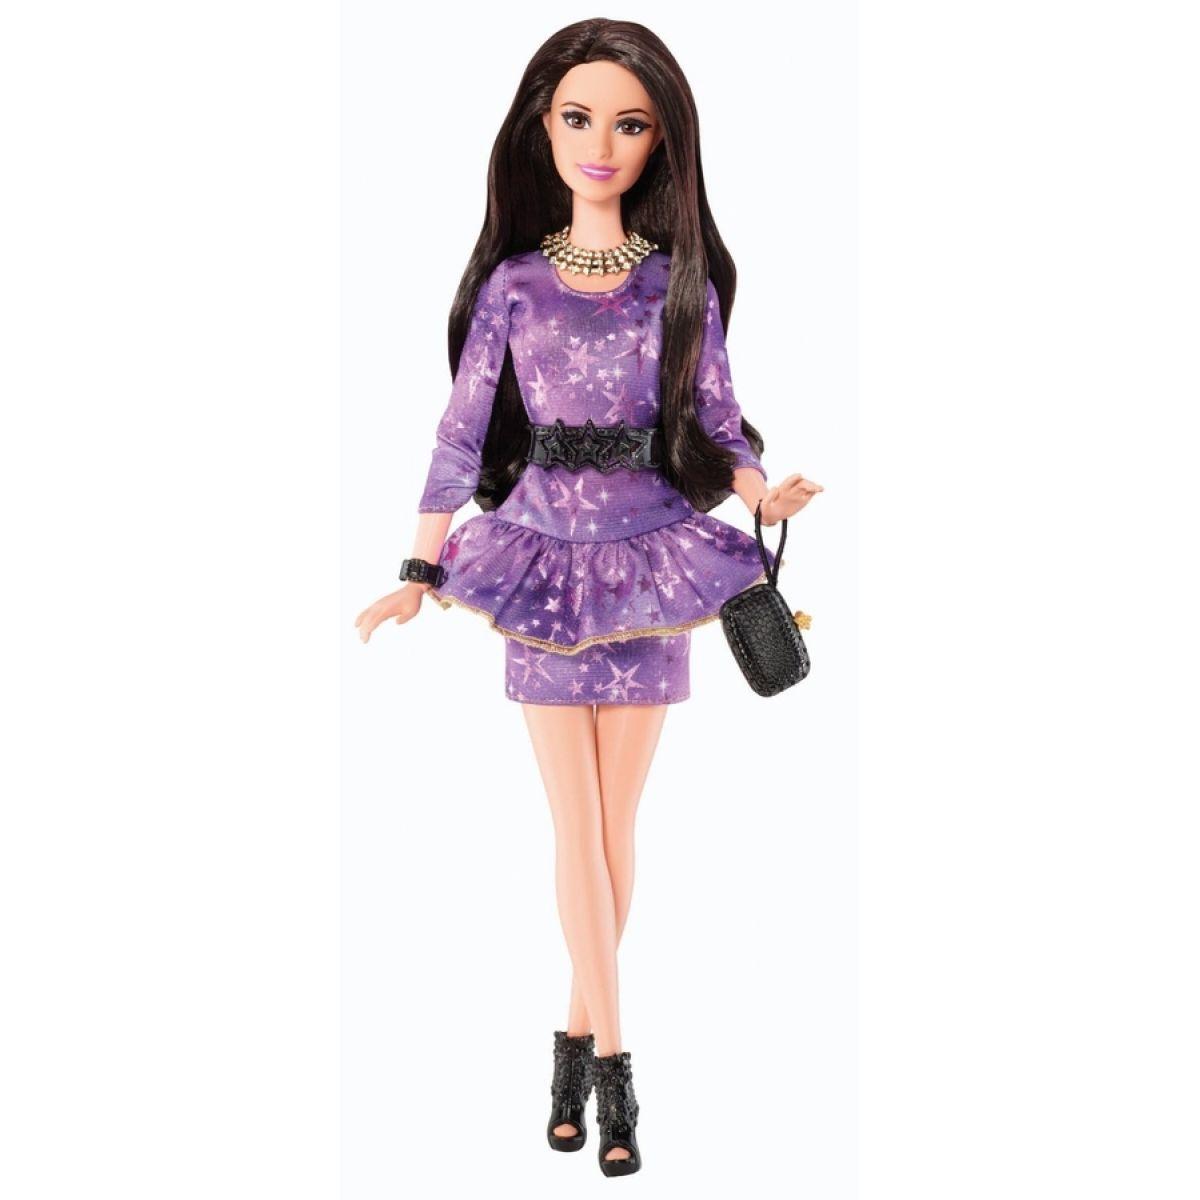 Barbie Dům snů Mluvící Raquell